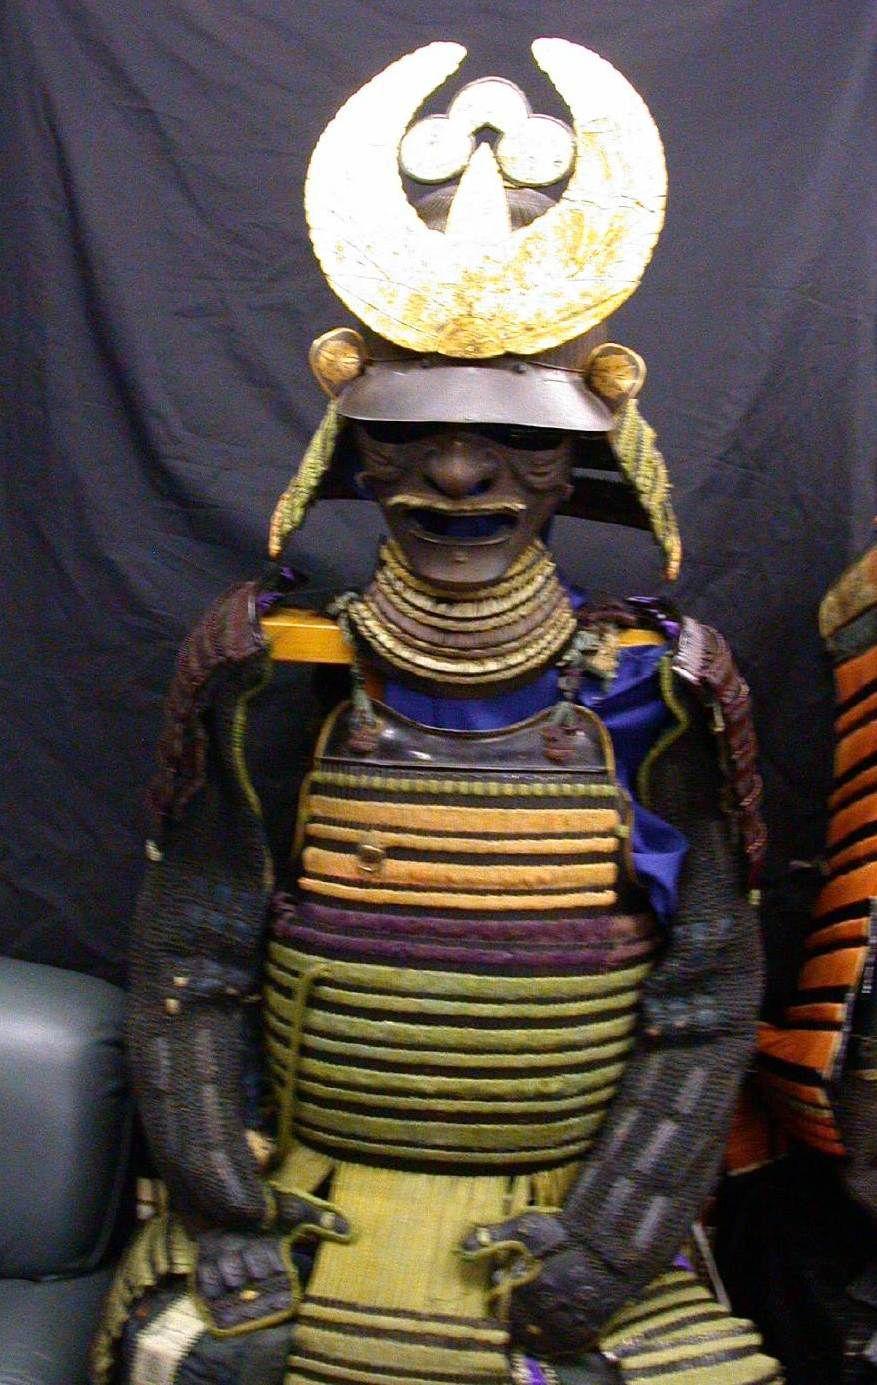 Samurai armor (Yoroi-Kabuto)